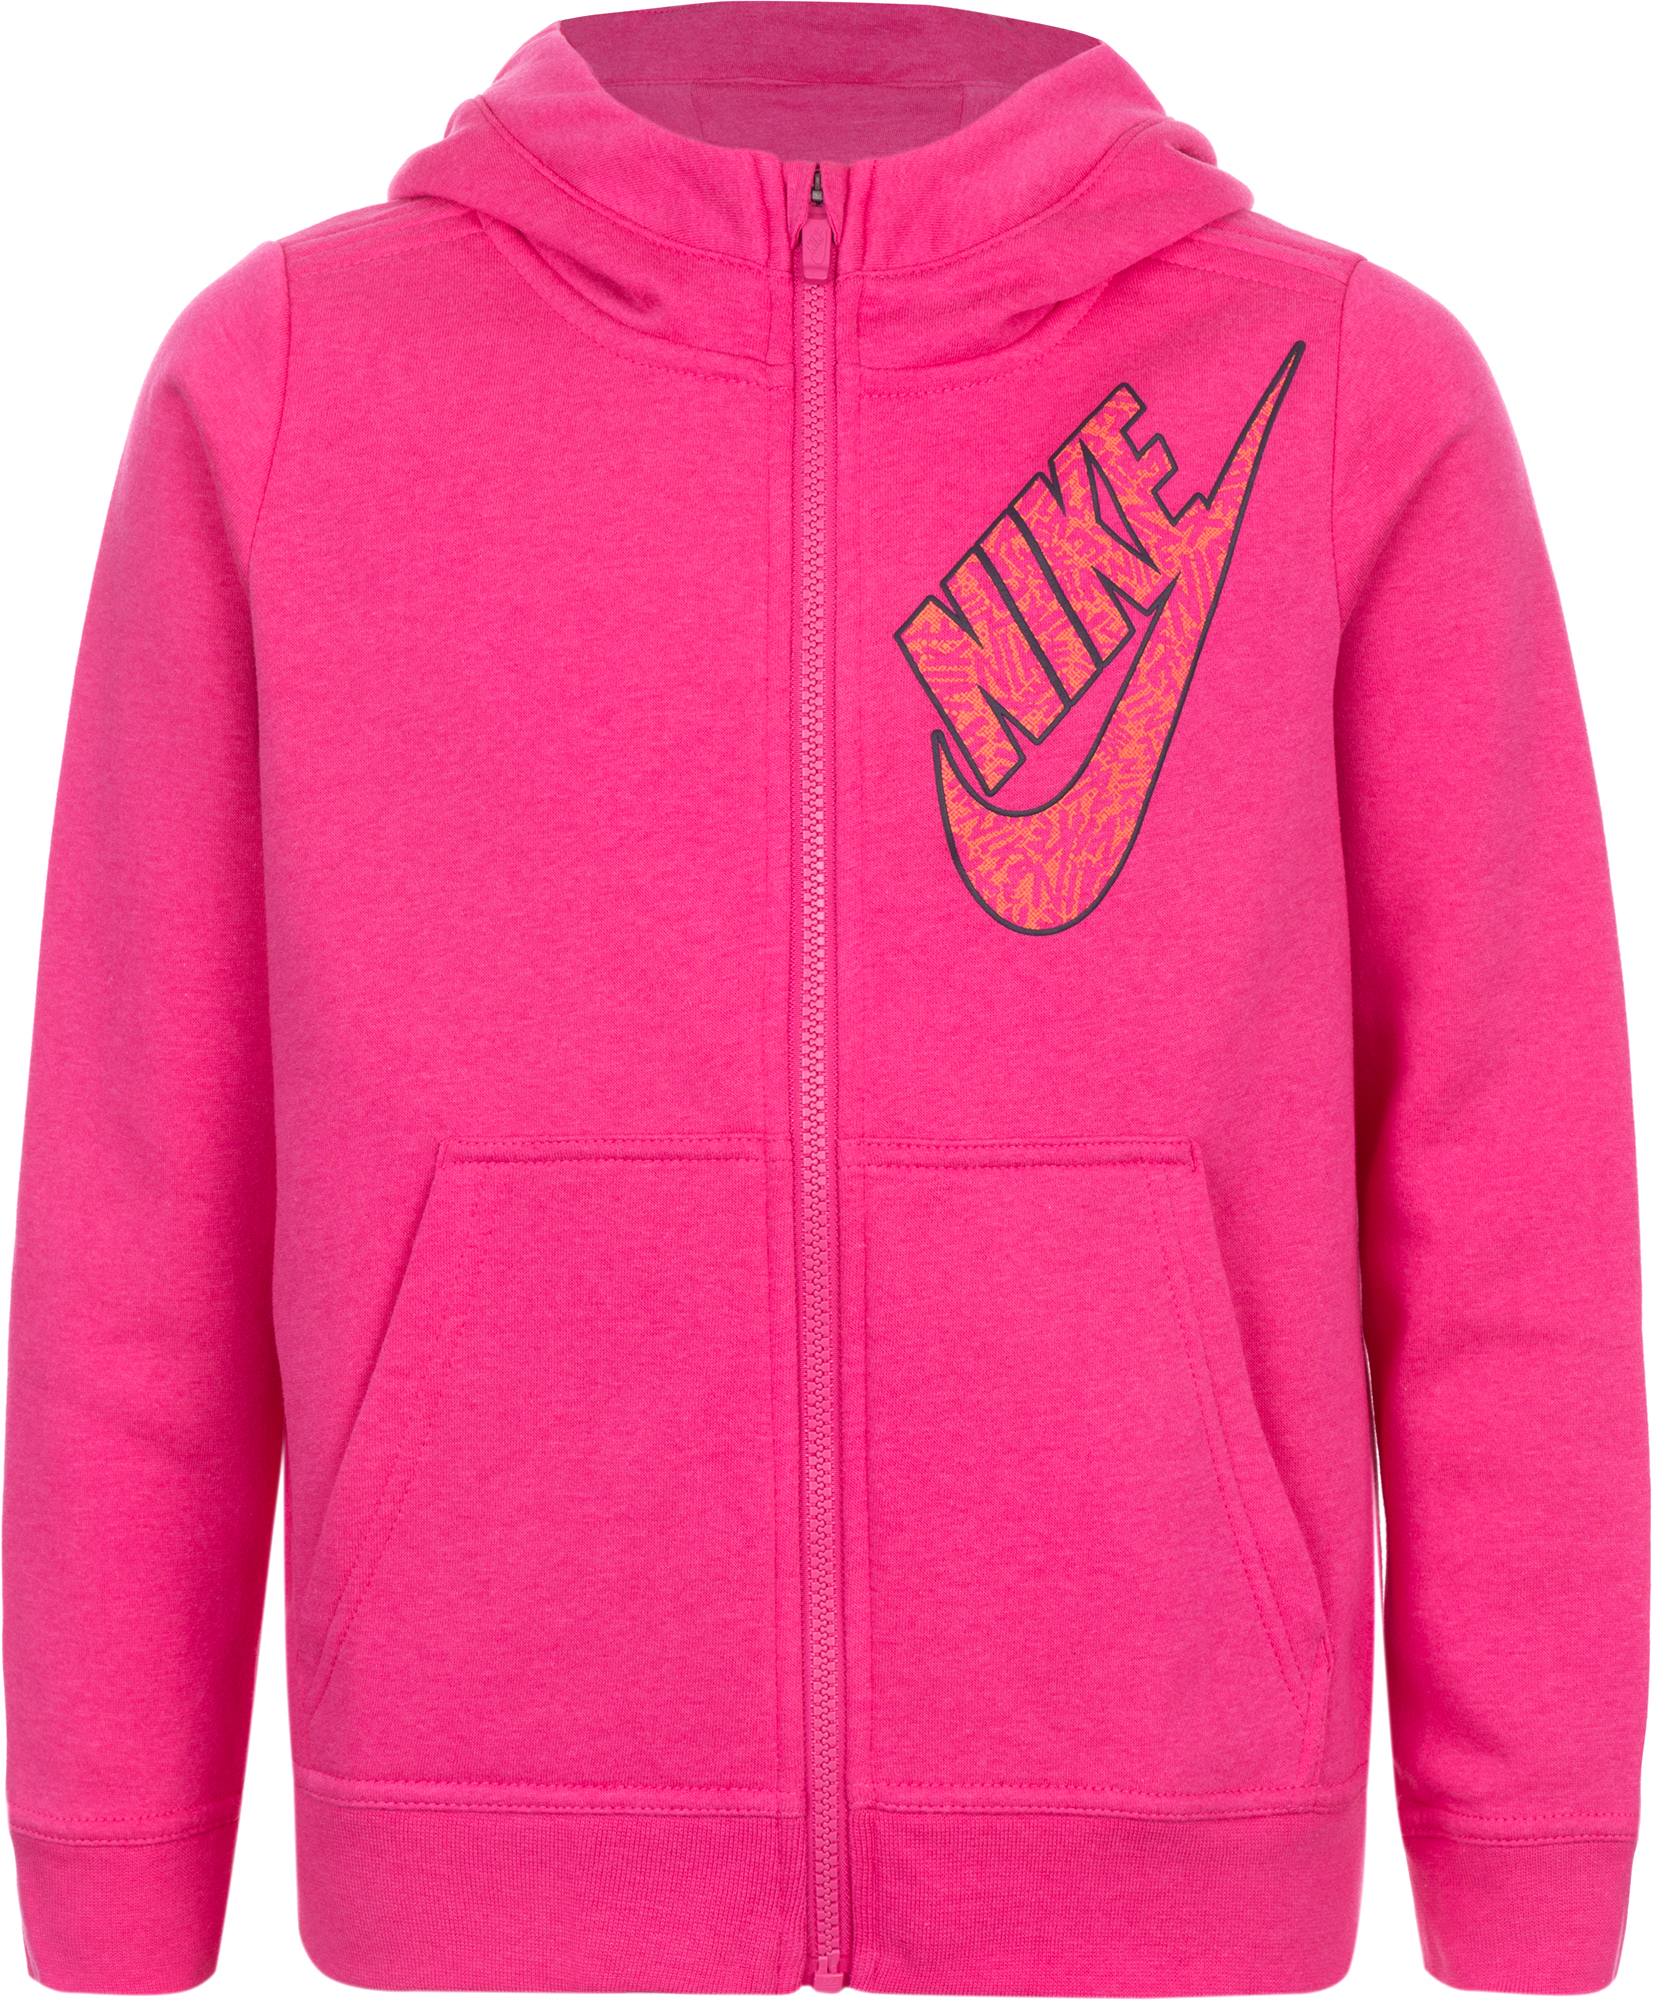 Nike Джемпер для девочек Nike